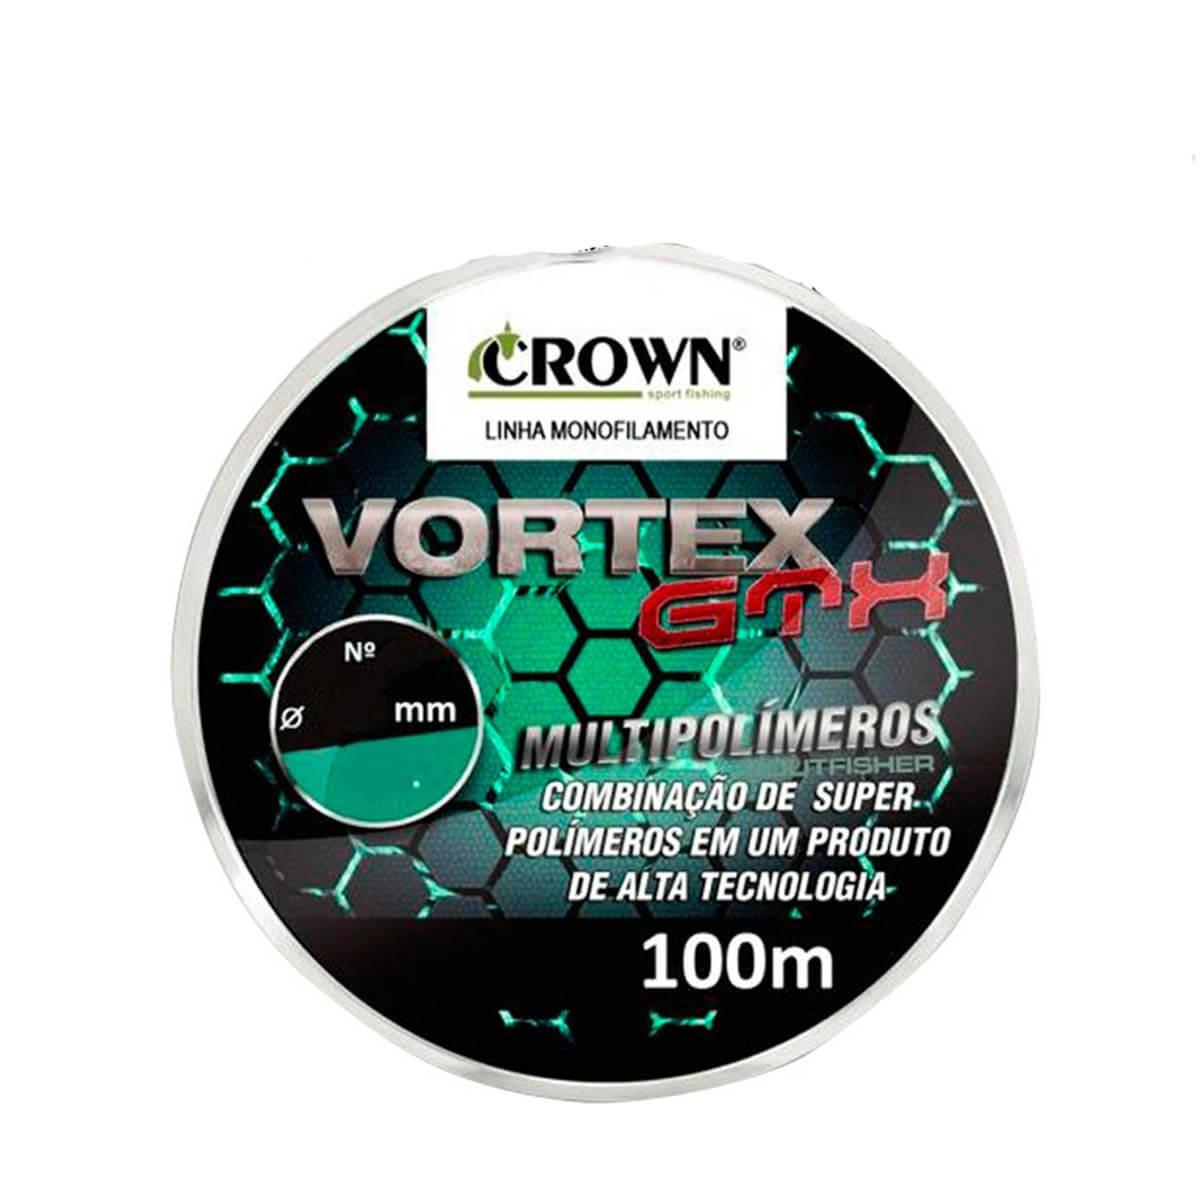 Linha Monofilamento Vortex Gtx 100m 0,40mm Crown